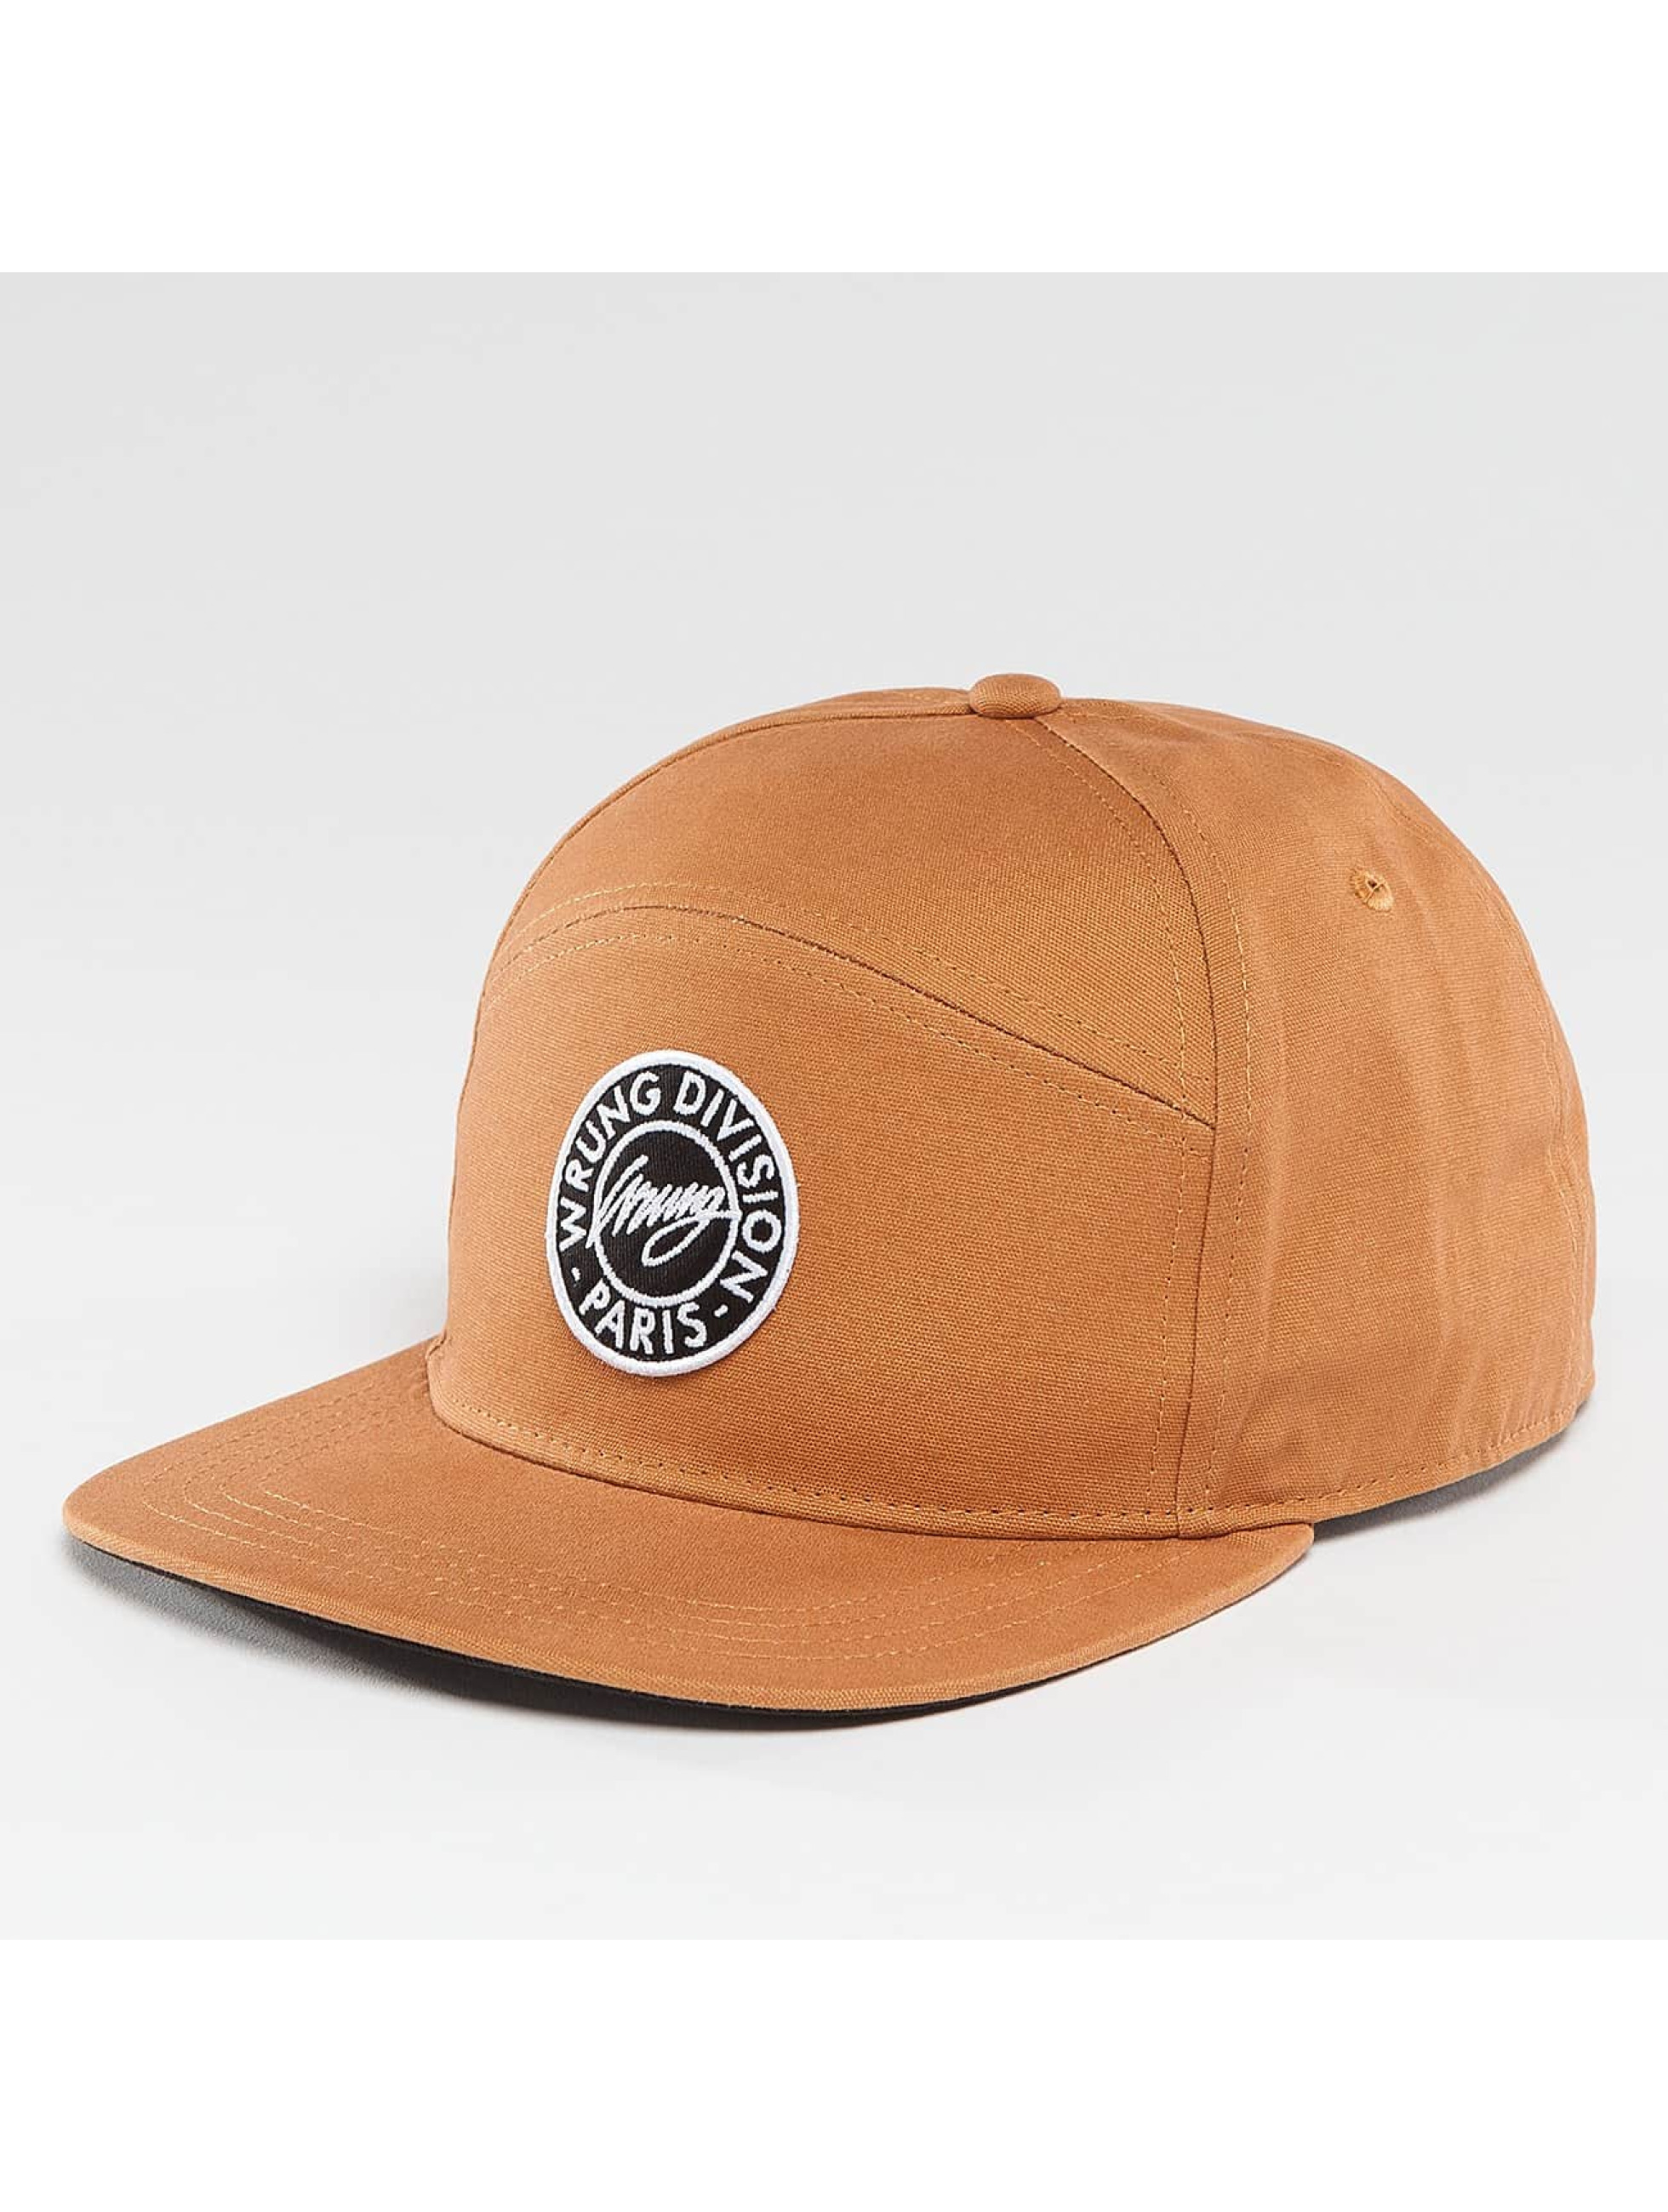 Wrung Division Casquette Snapback & Strapback Work brun